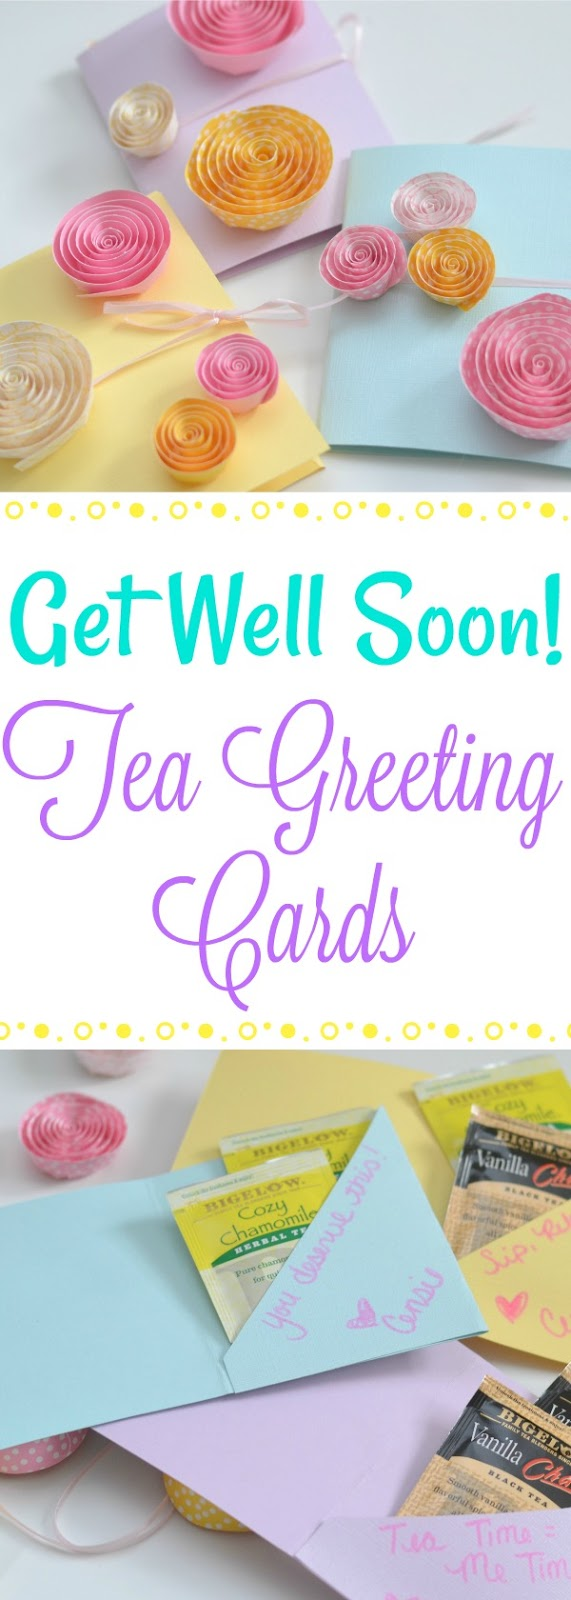 Get Well Soon Tea Greeting Cards